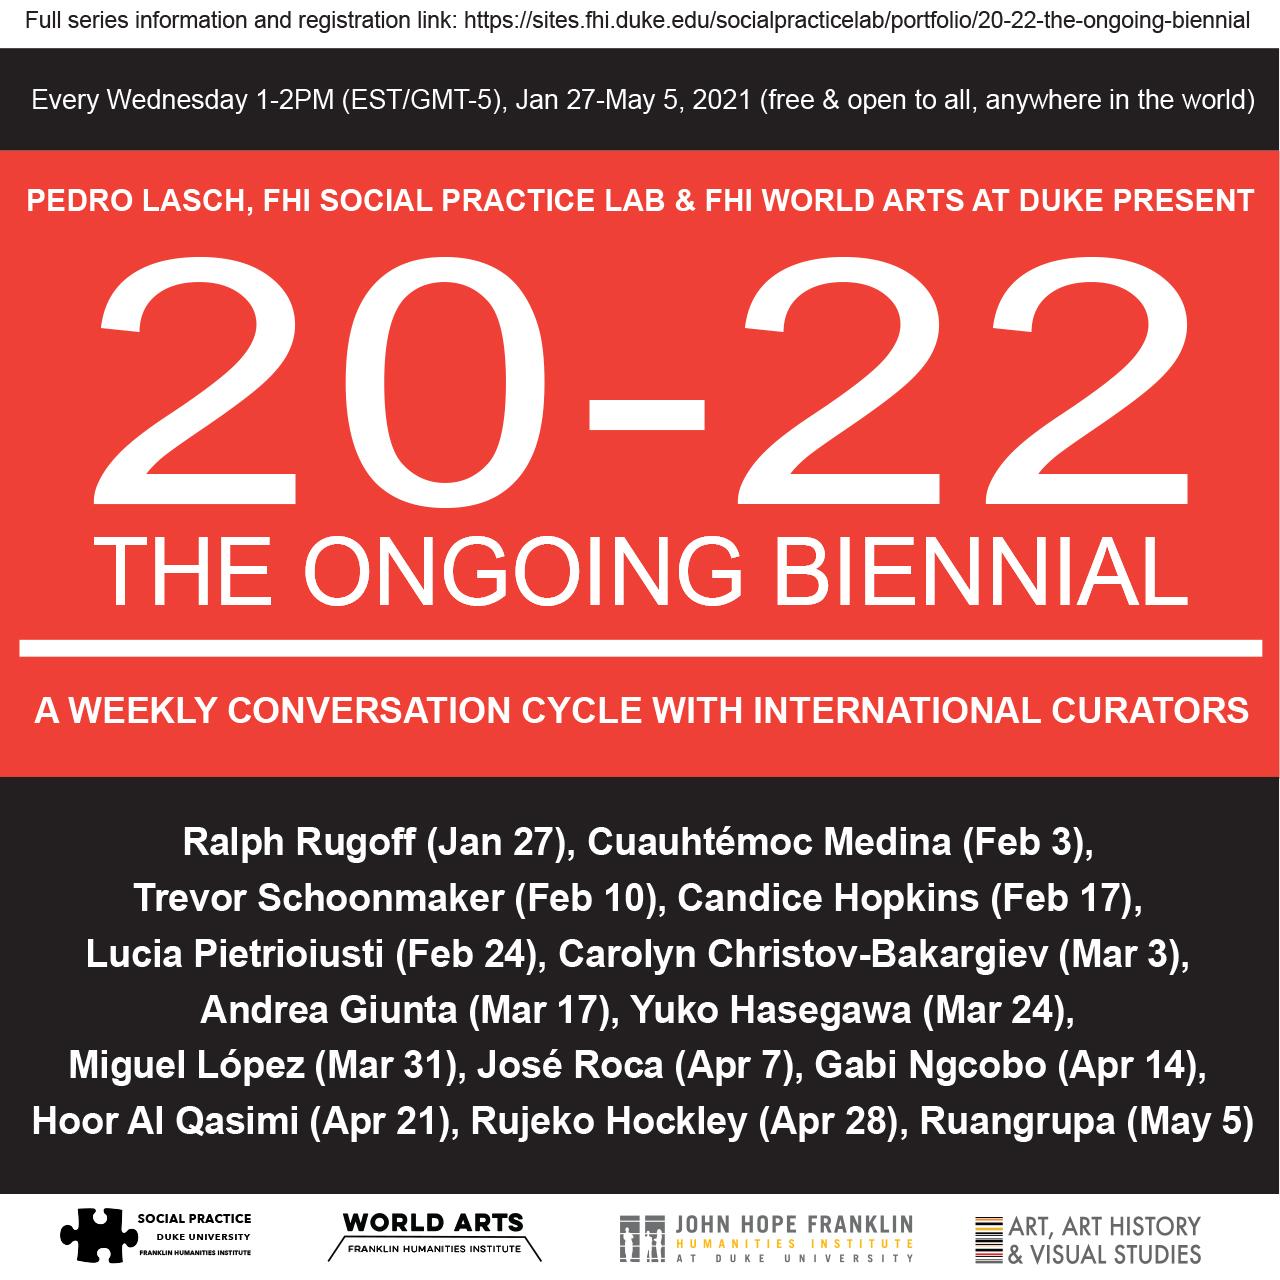 20-22 The Ongoing Biennial